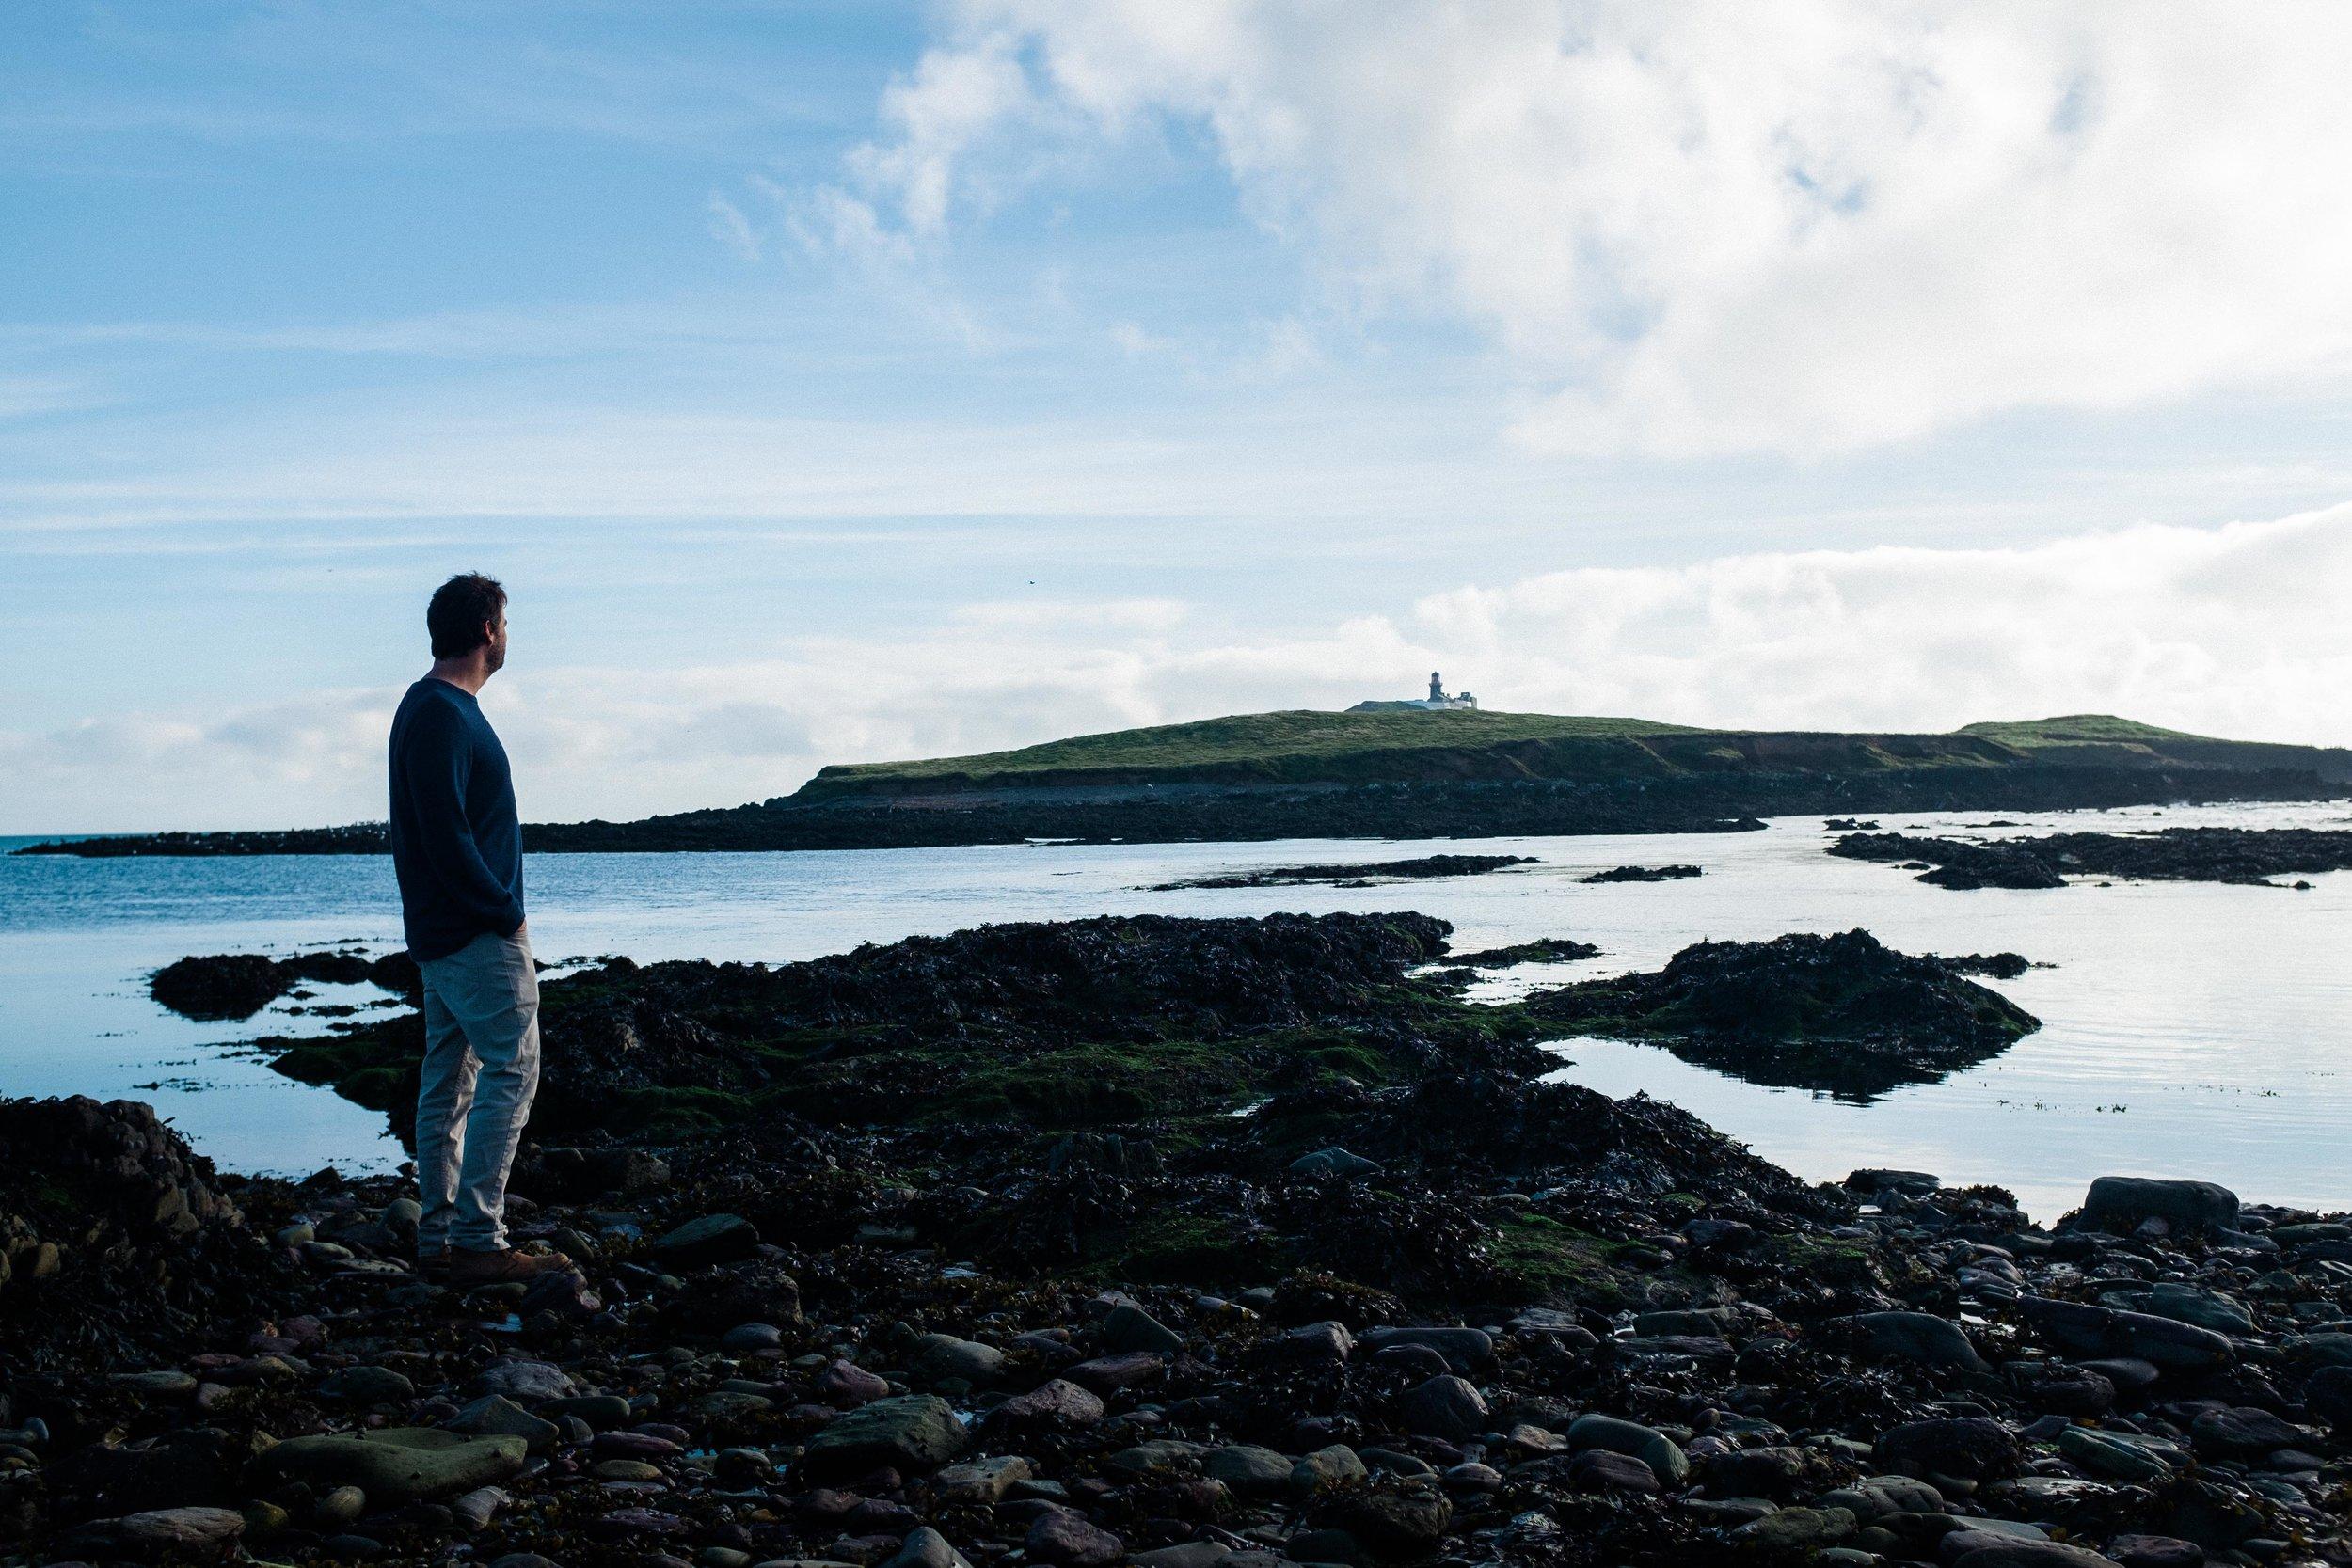 ballycotton-ireland-cliff-walk-5850.jpg